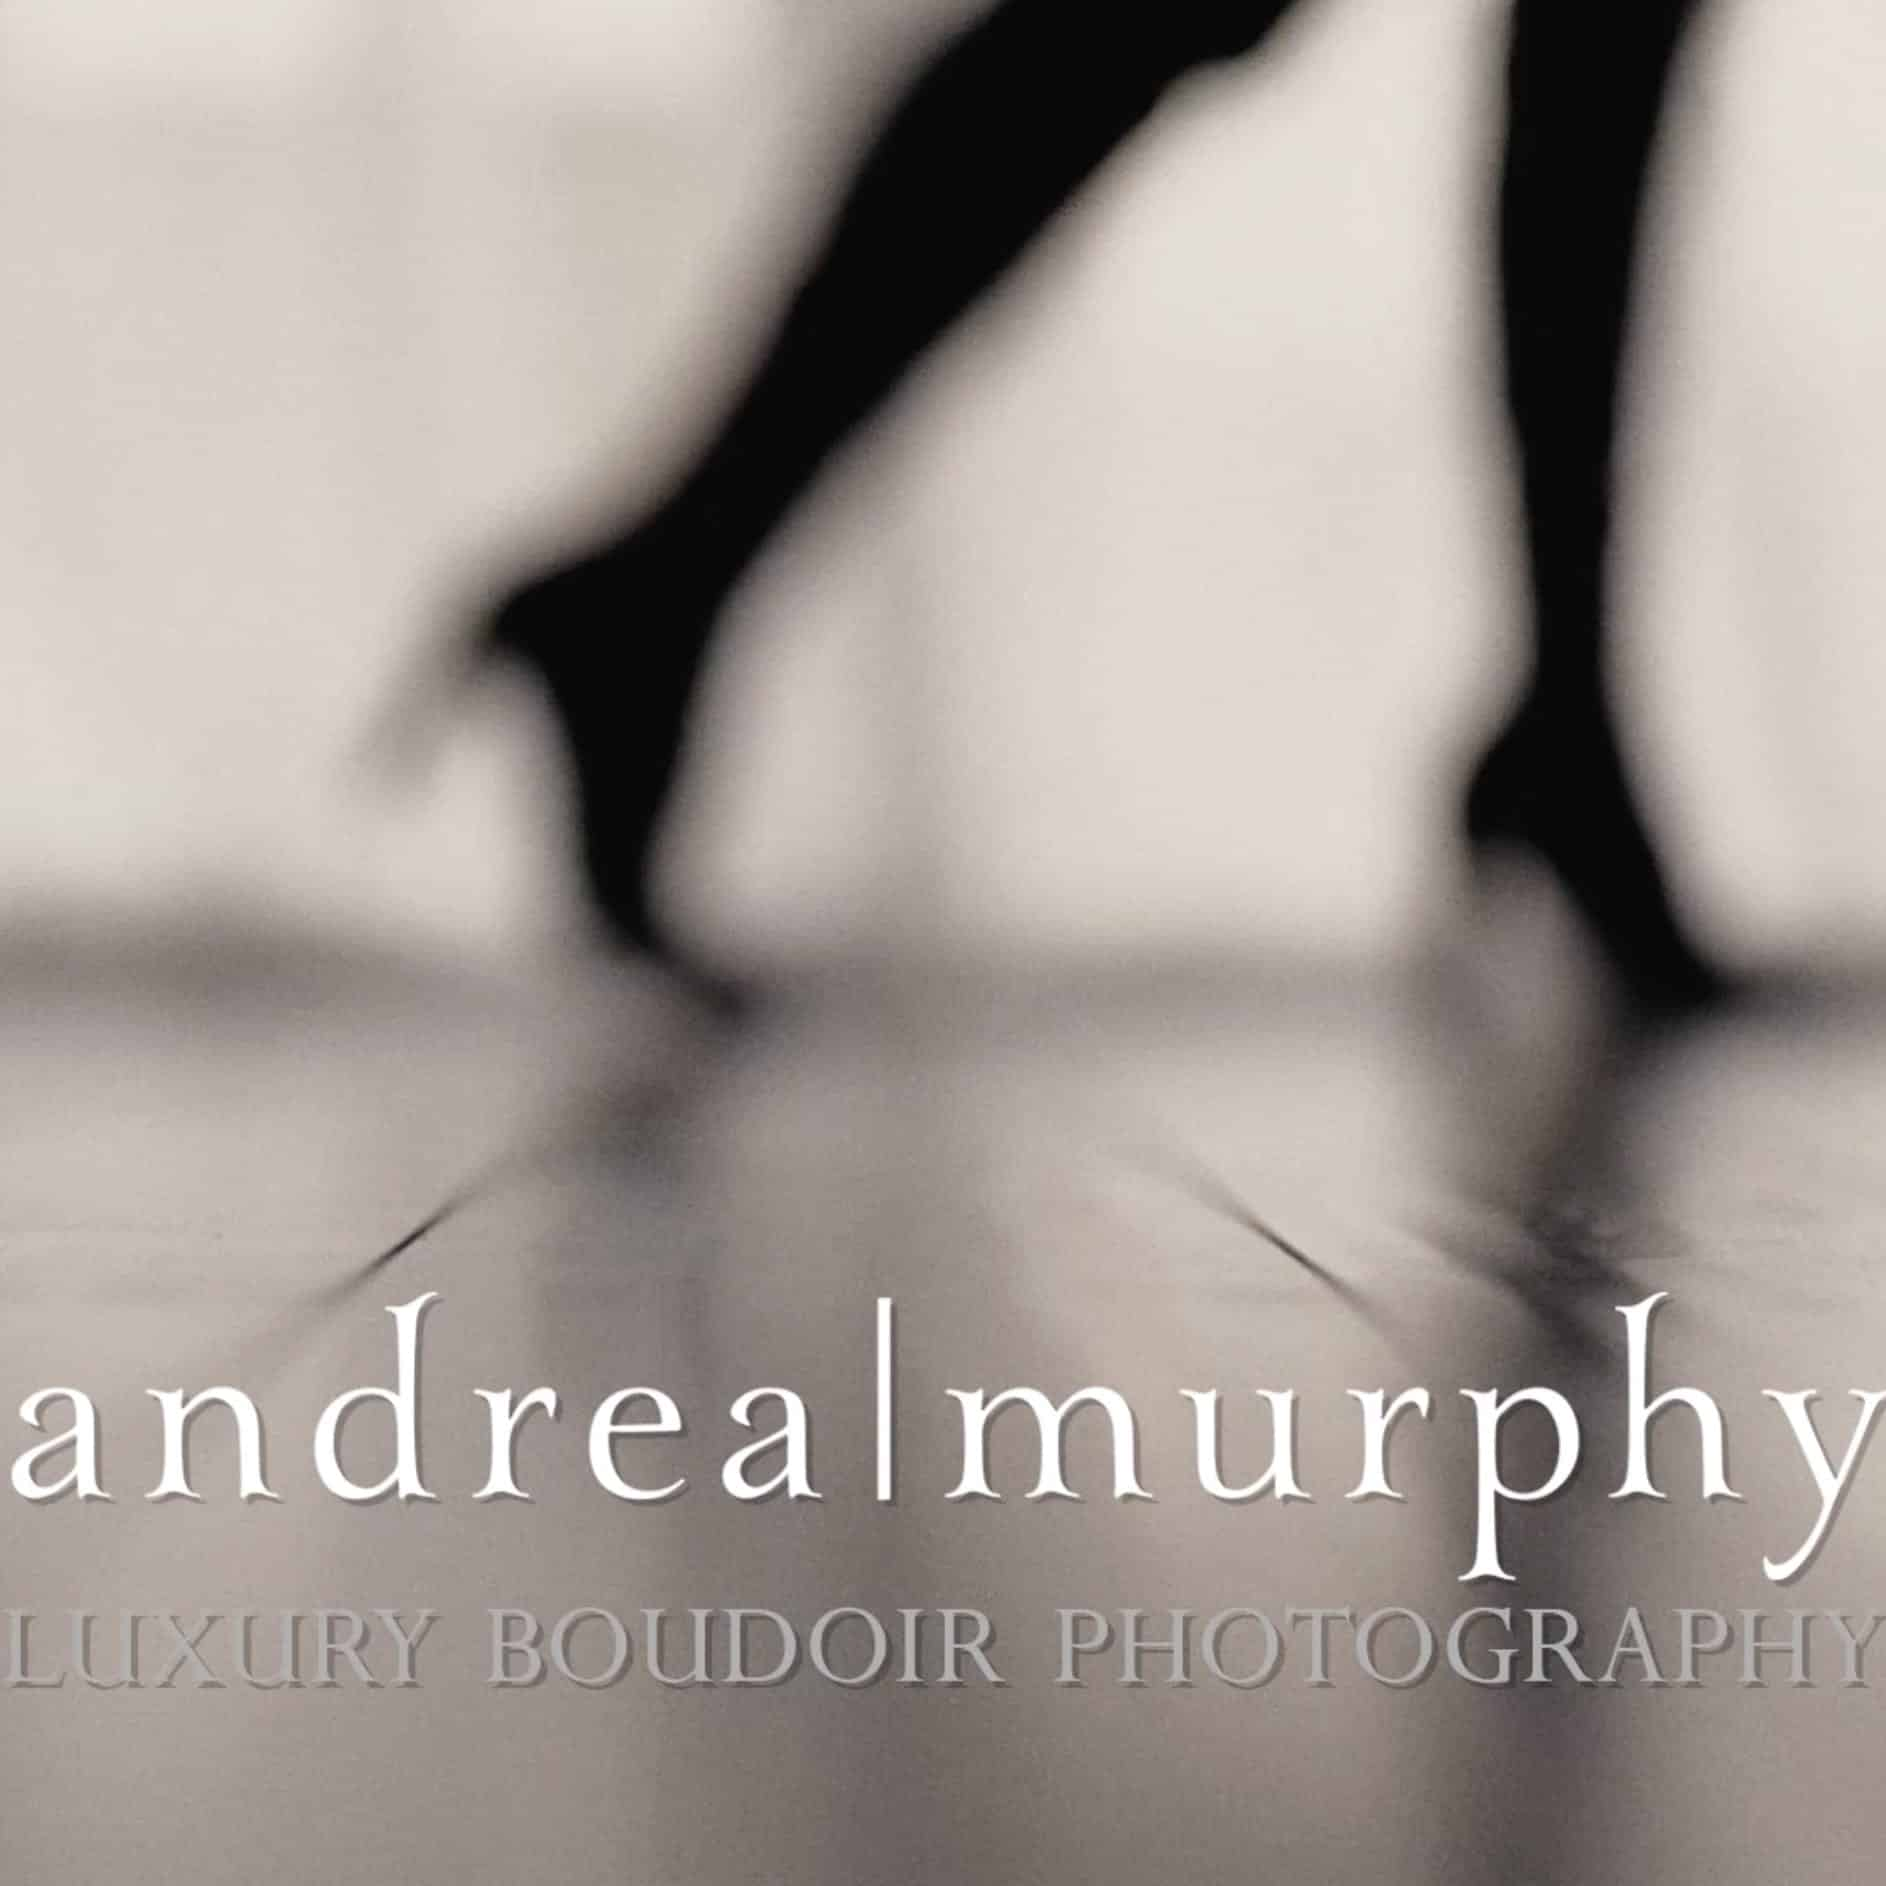 Andrea Murphy Luxury Boudoir